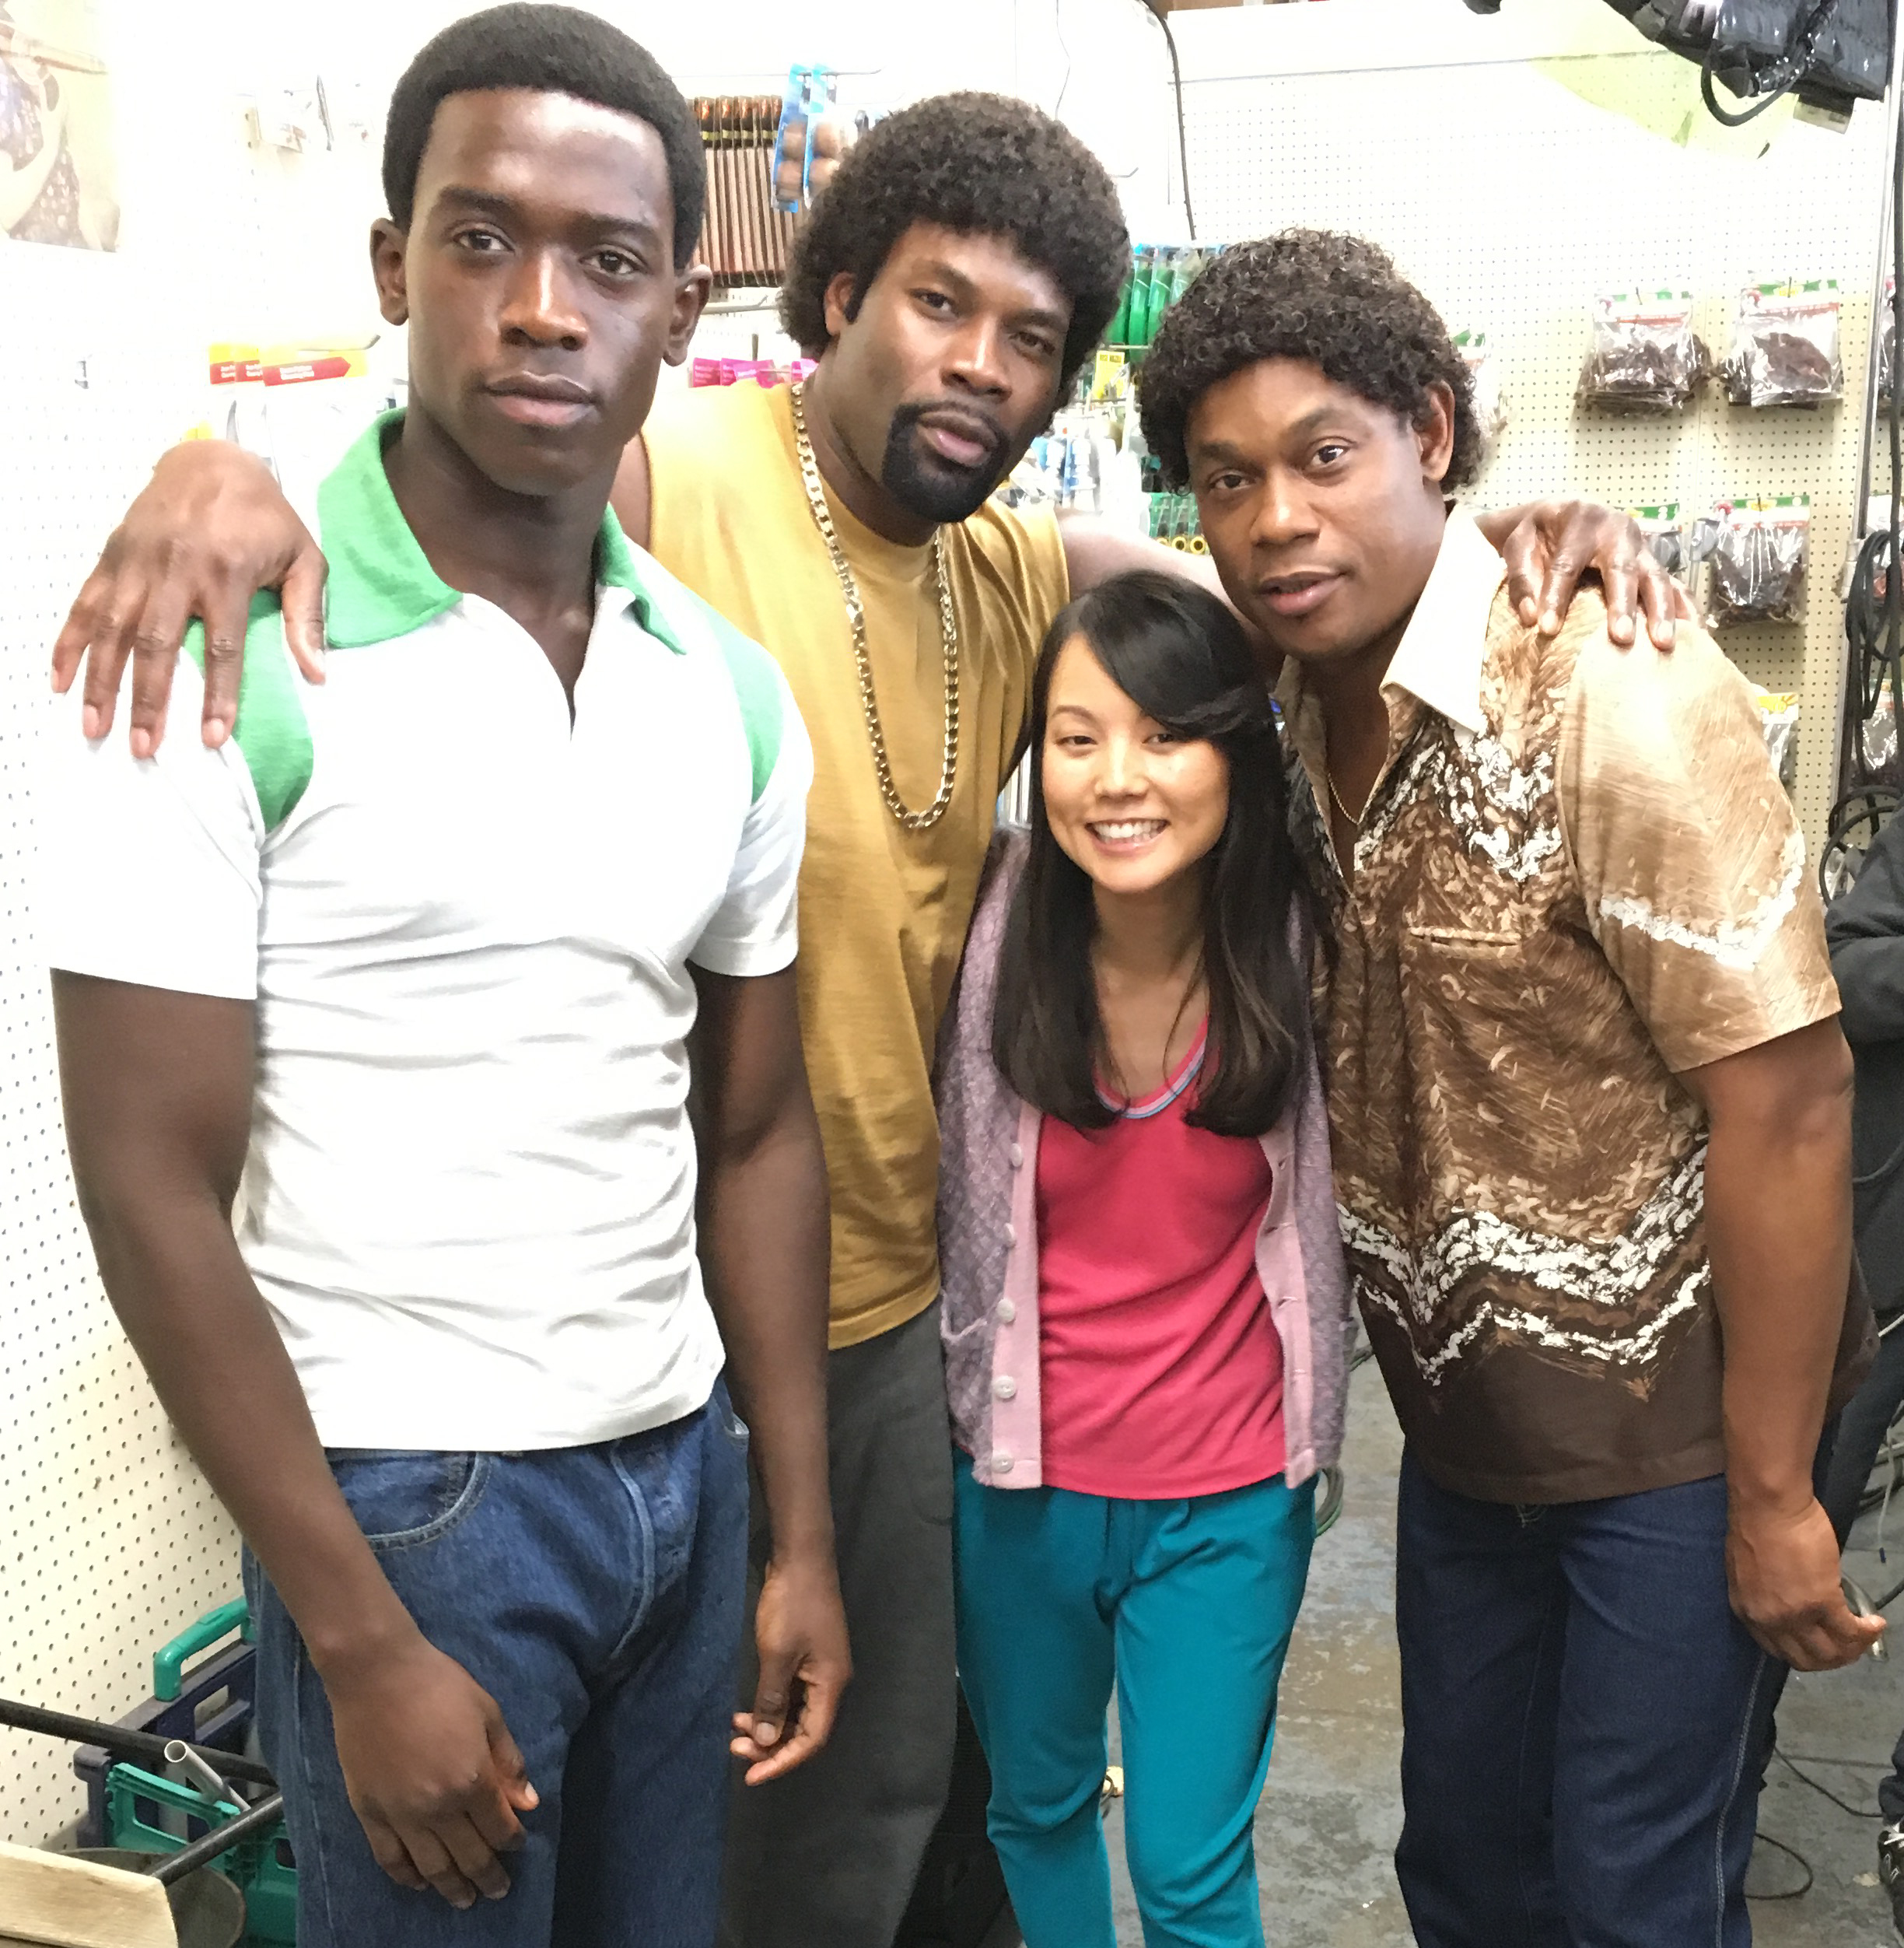 Damson Idris, Amin Joseph, and Bokeem Woodbine, my hubbie for the day!!!